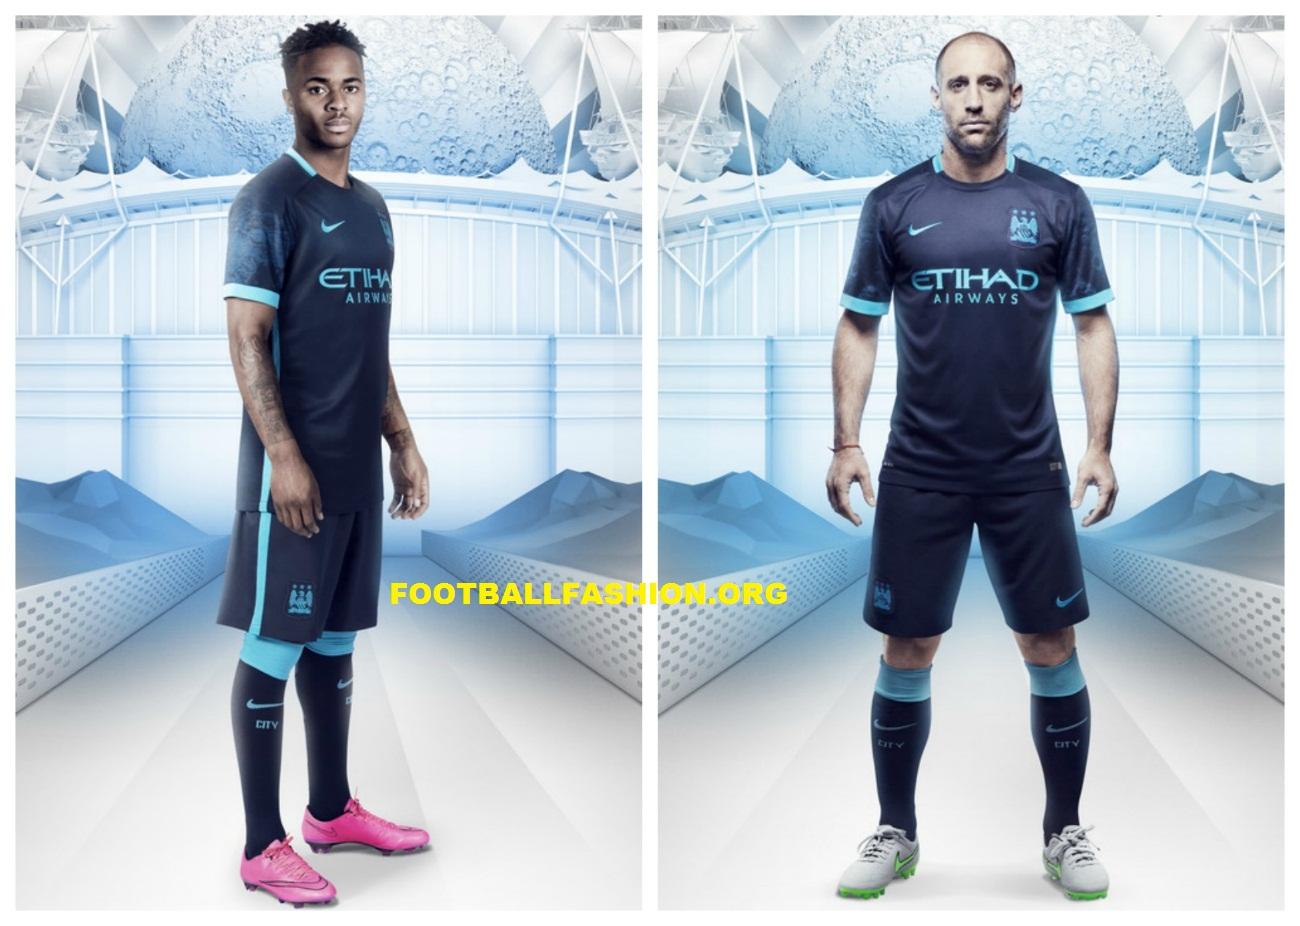 2e6bc139 Manchester City Football Club 2015 2016 Nike Away Kit, Soccer Jersey, Shirt,  Camiseta